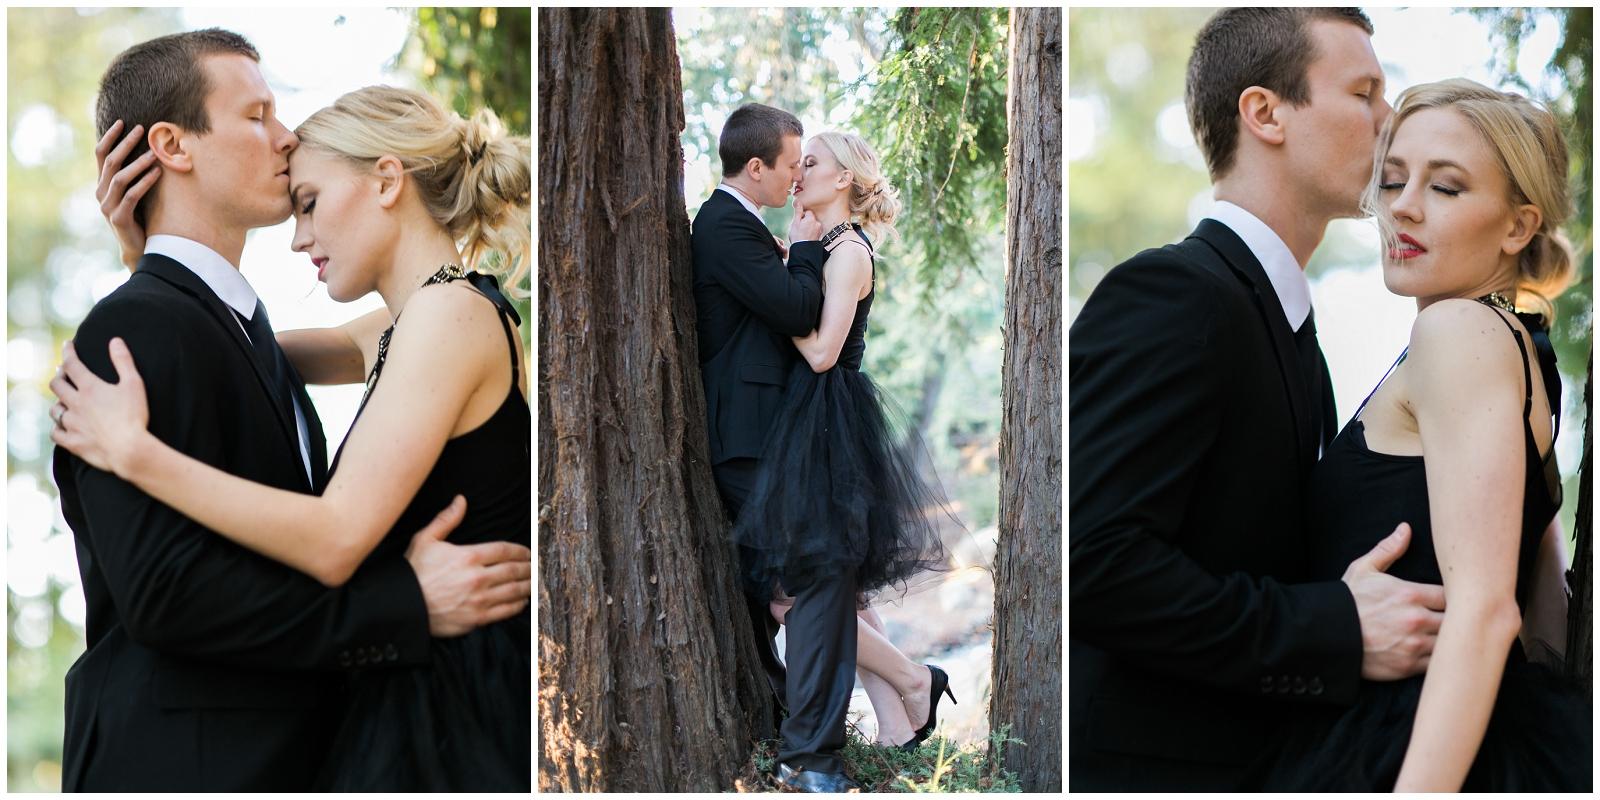 San-Francisco-Bay-Area-Wedding-Photography-Engagement-Redwoods-13.jpg